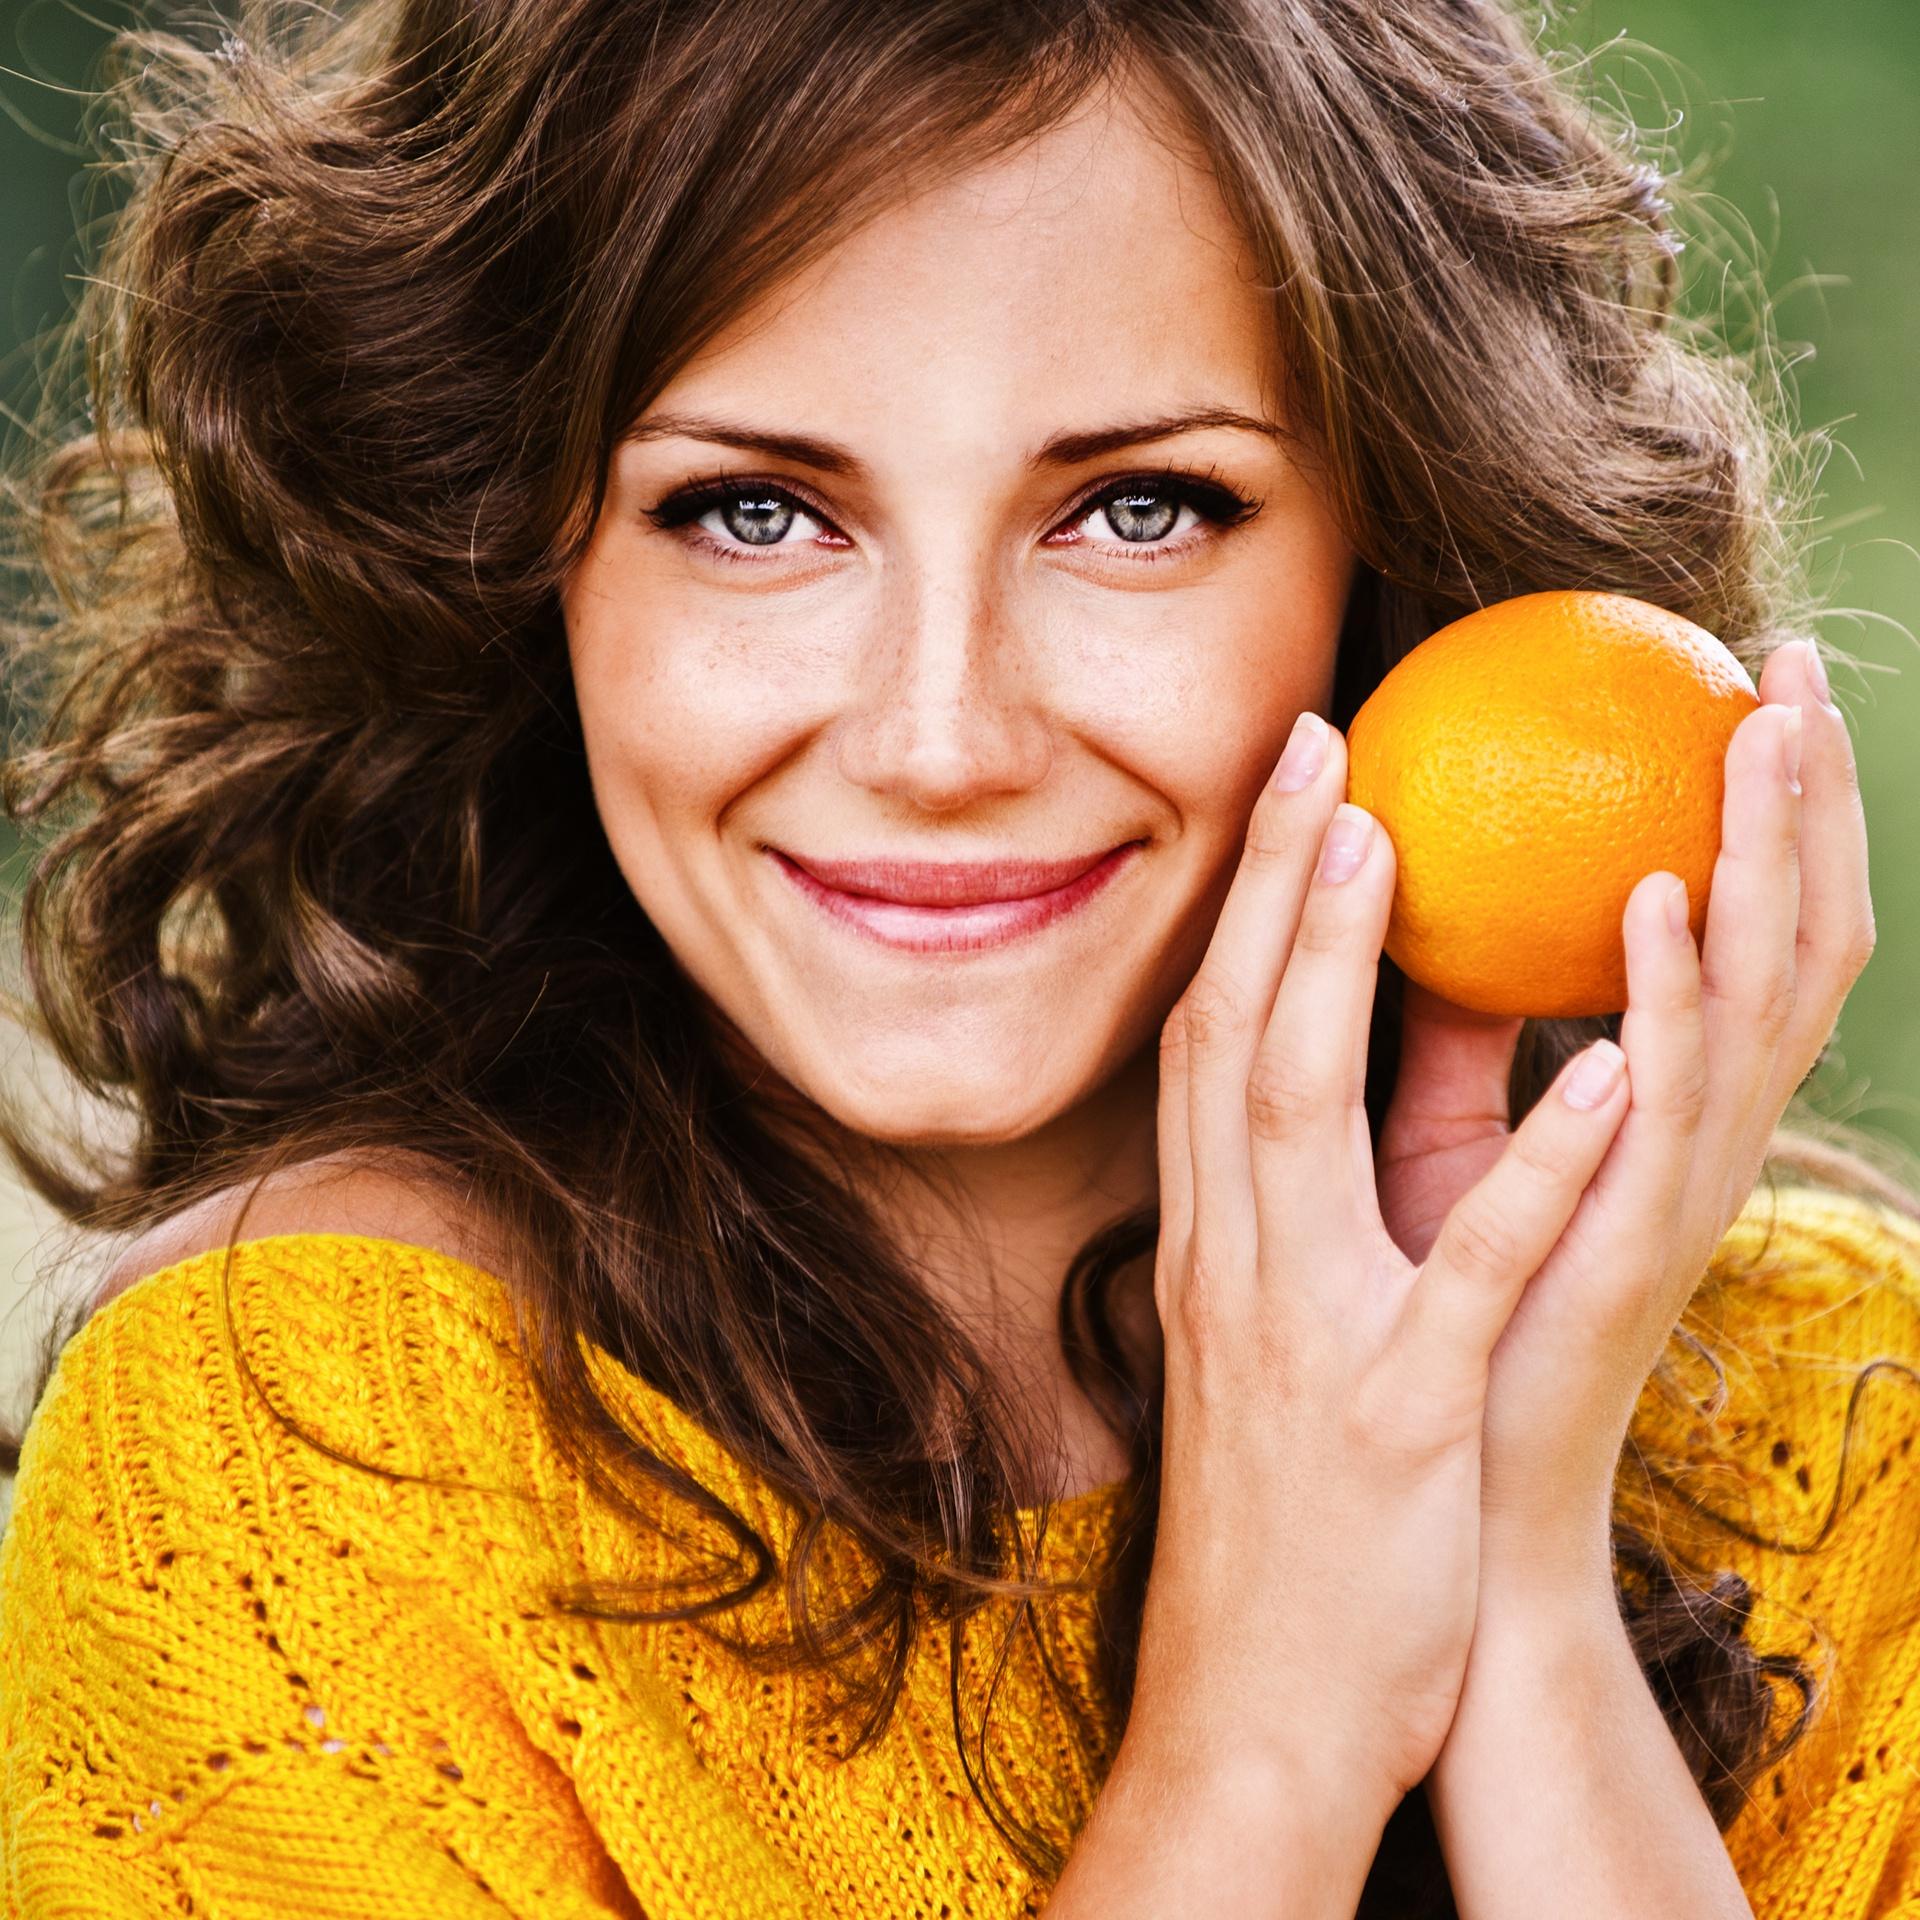 sites/26618457/Woman_Orange_Newbie_1920.jpg